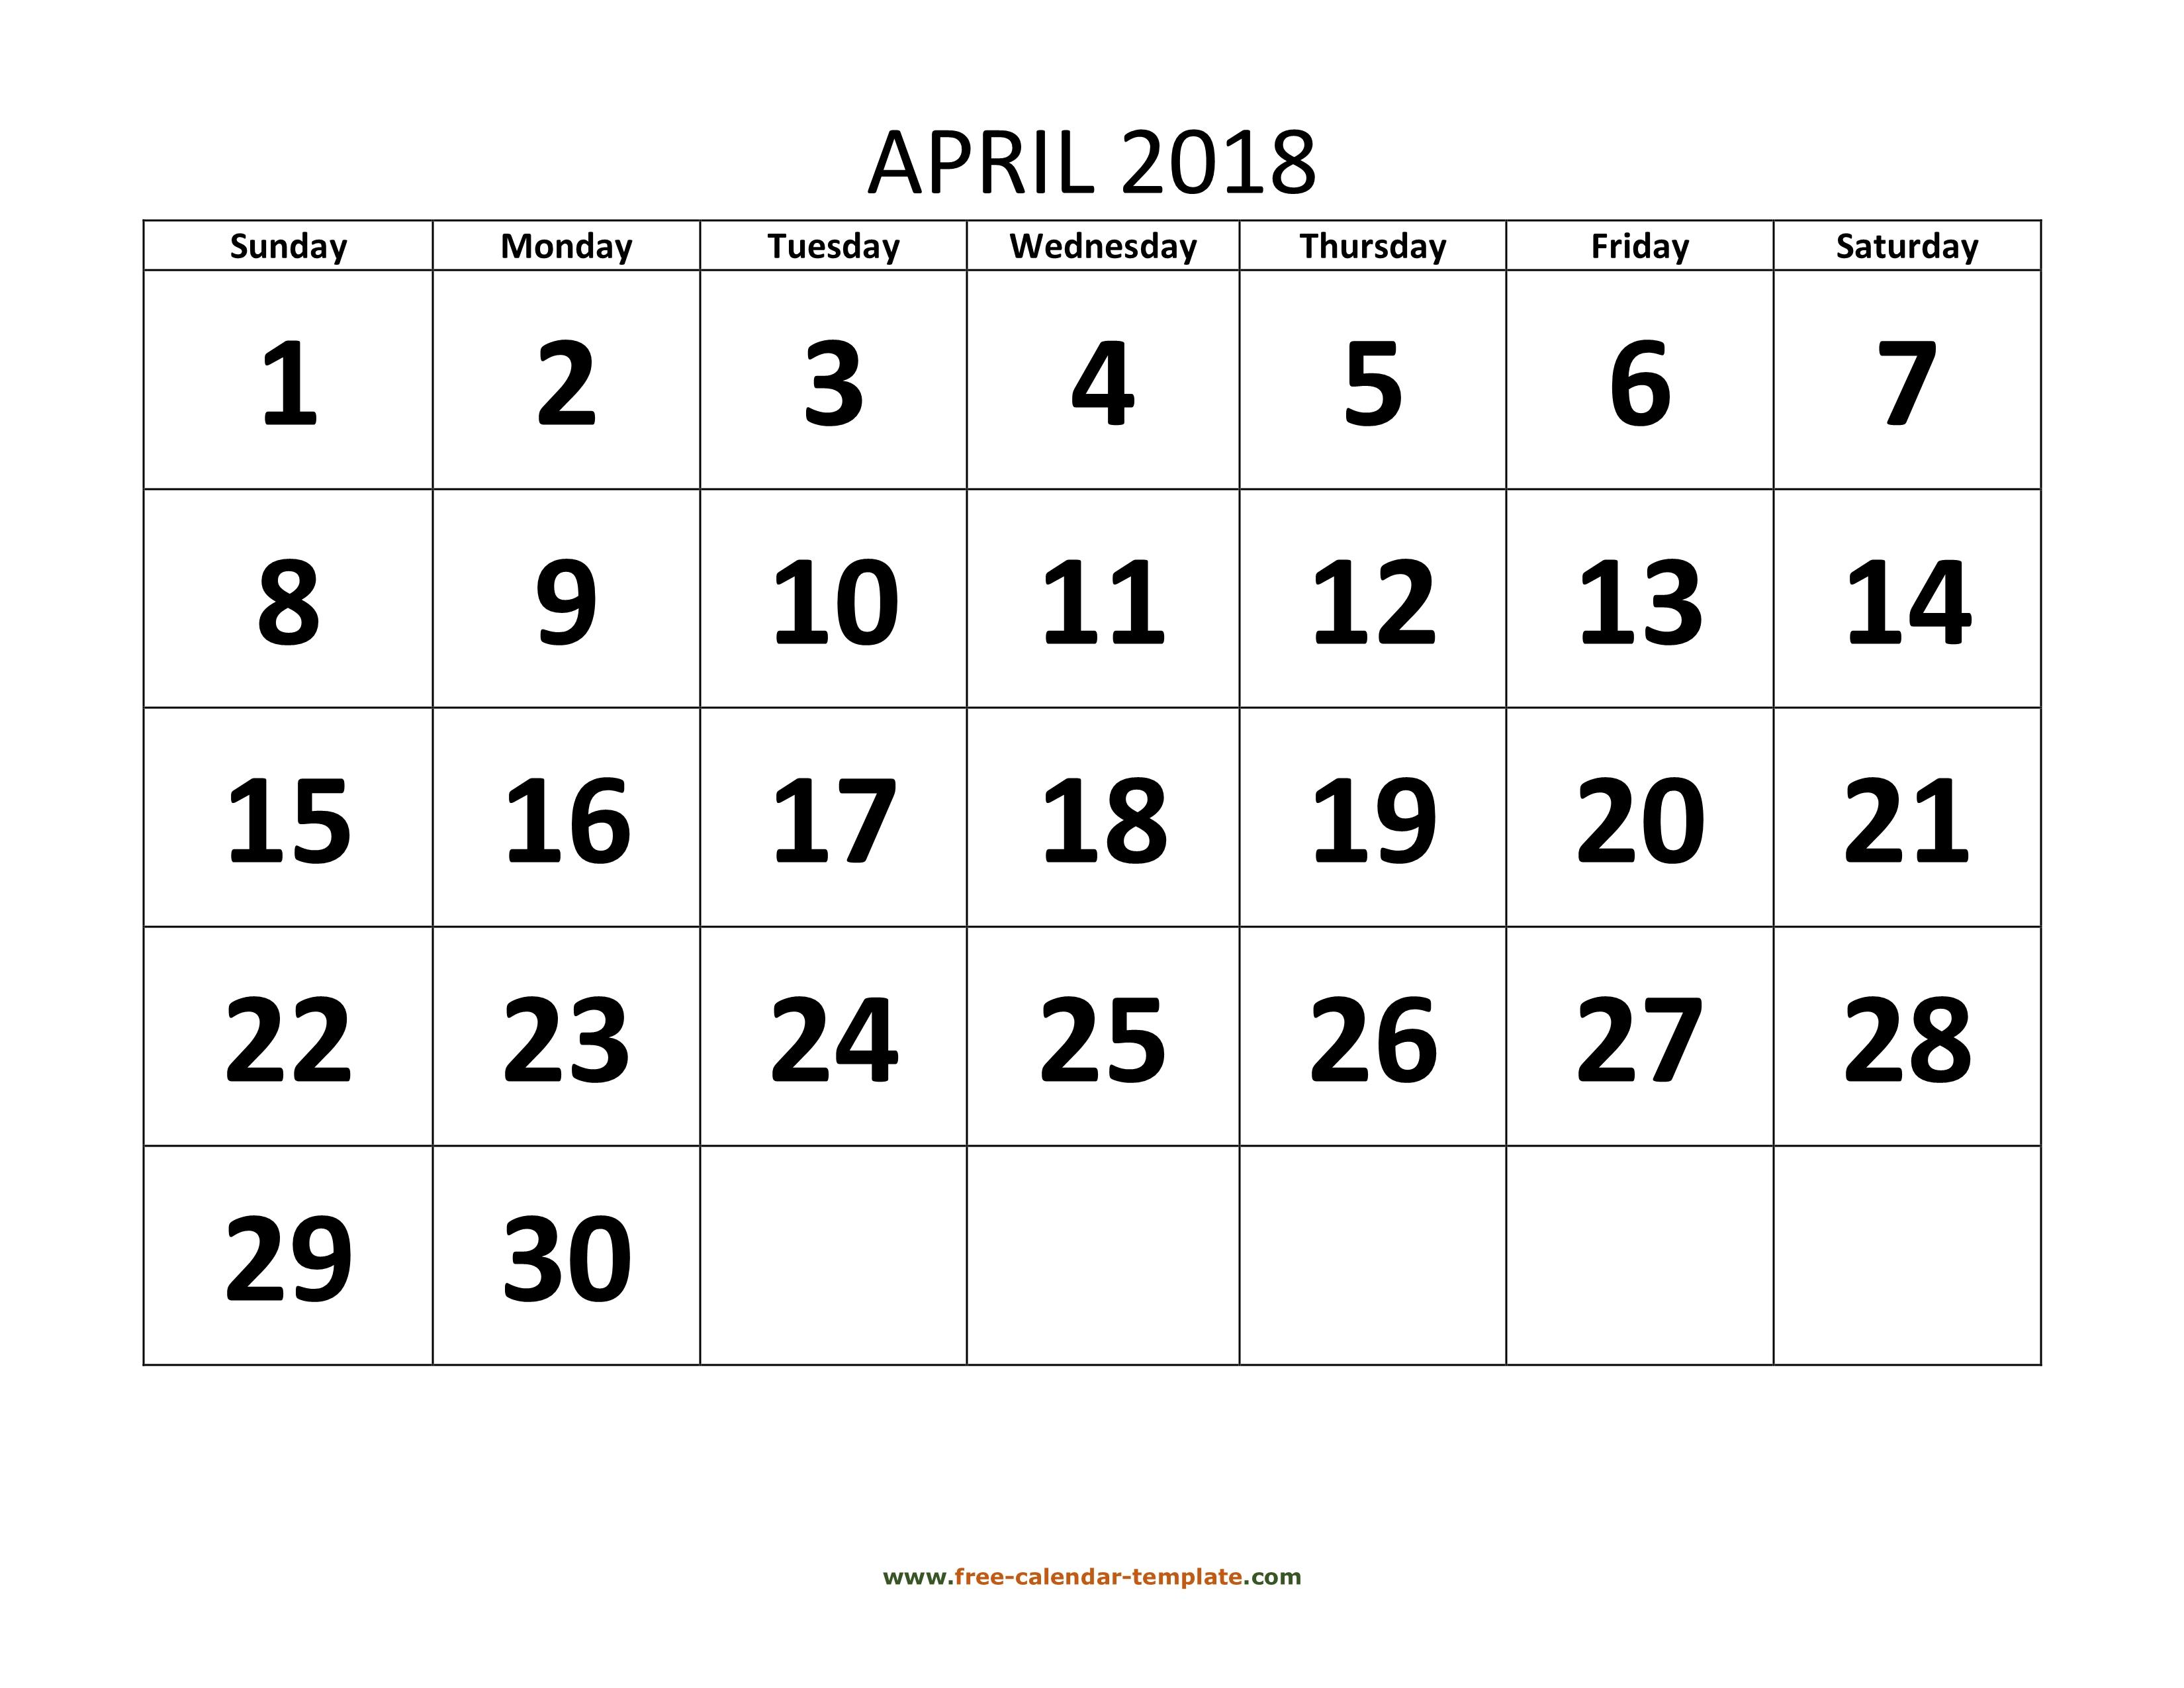 April 2018 Free Calendar Tempplate Free Calendar Template